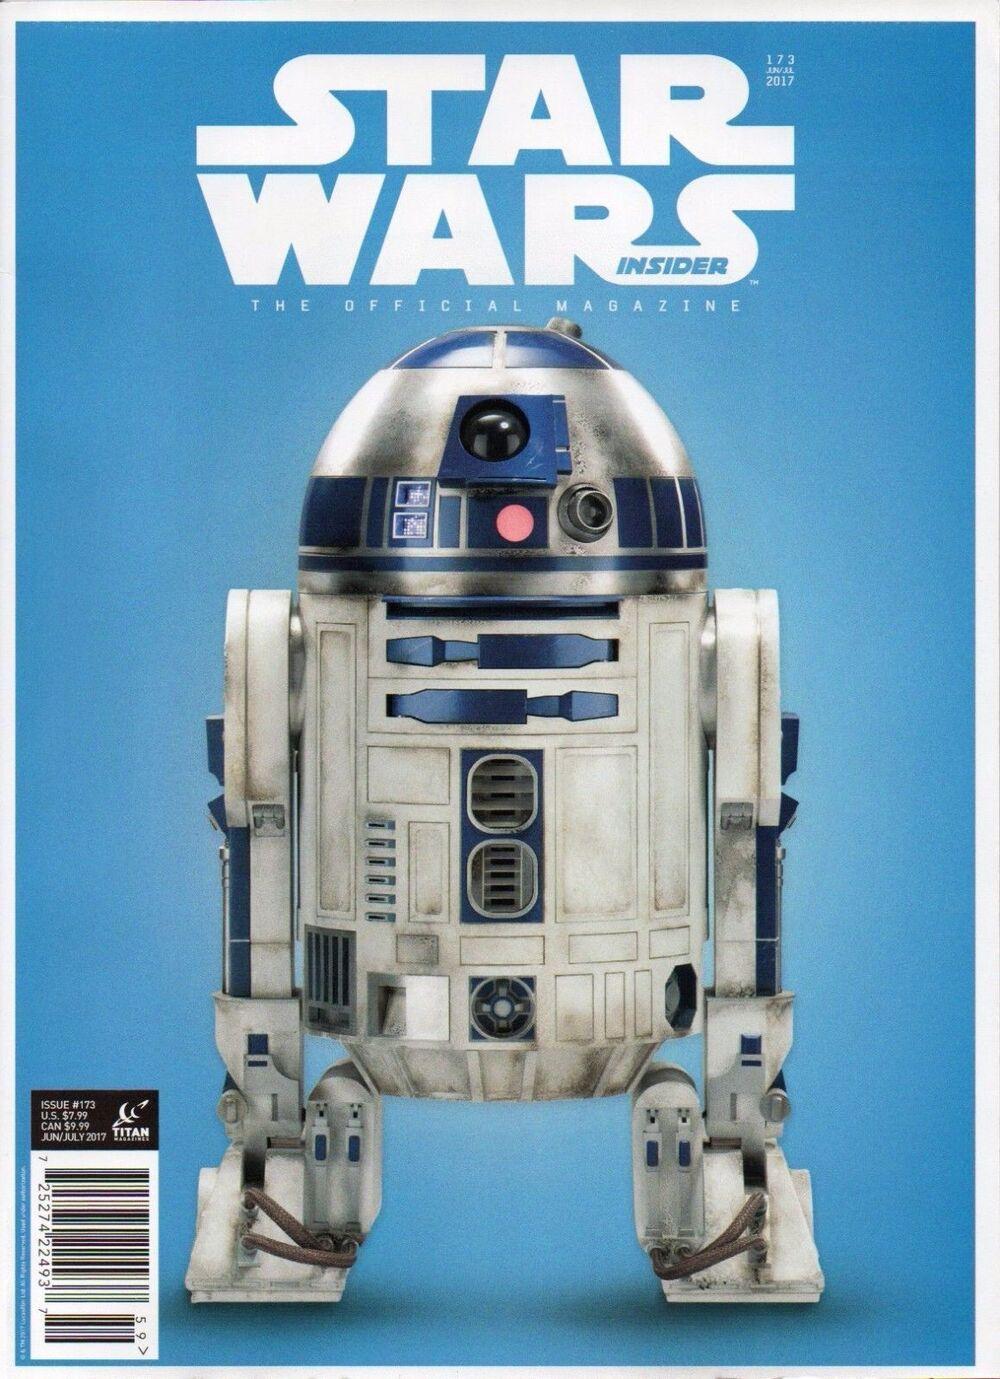 Star Wars Insider 173 - Previews Edition